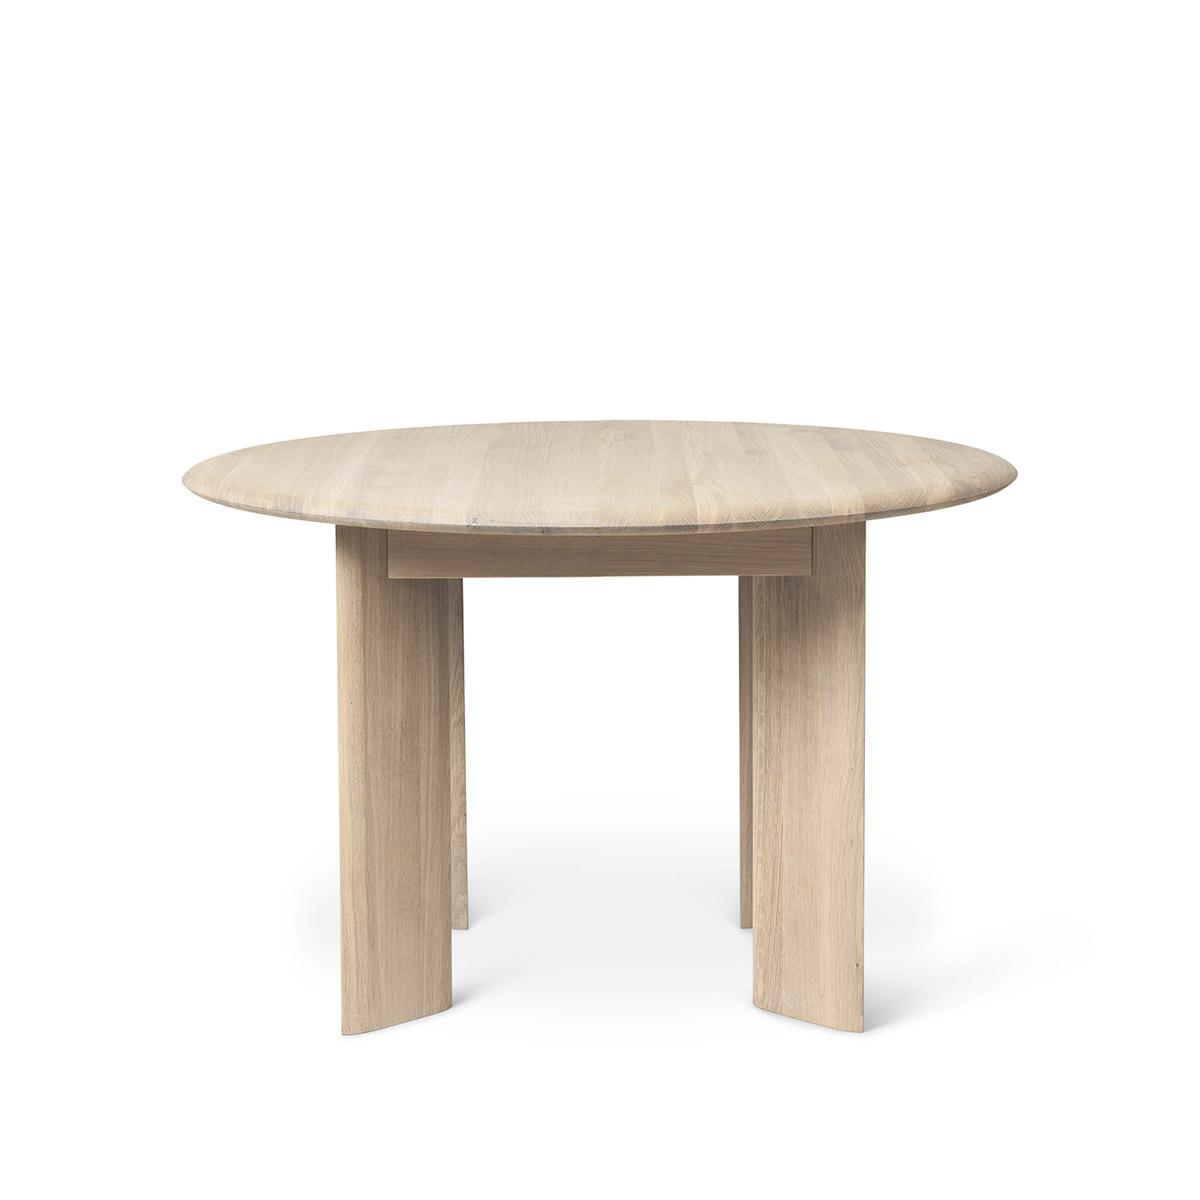 Spisebord Bevel Ø117 Hvit Oljet Eik